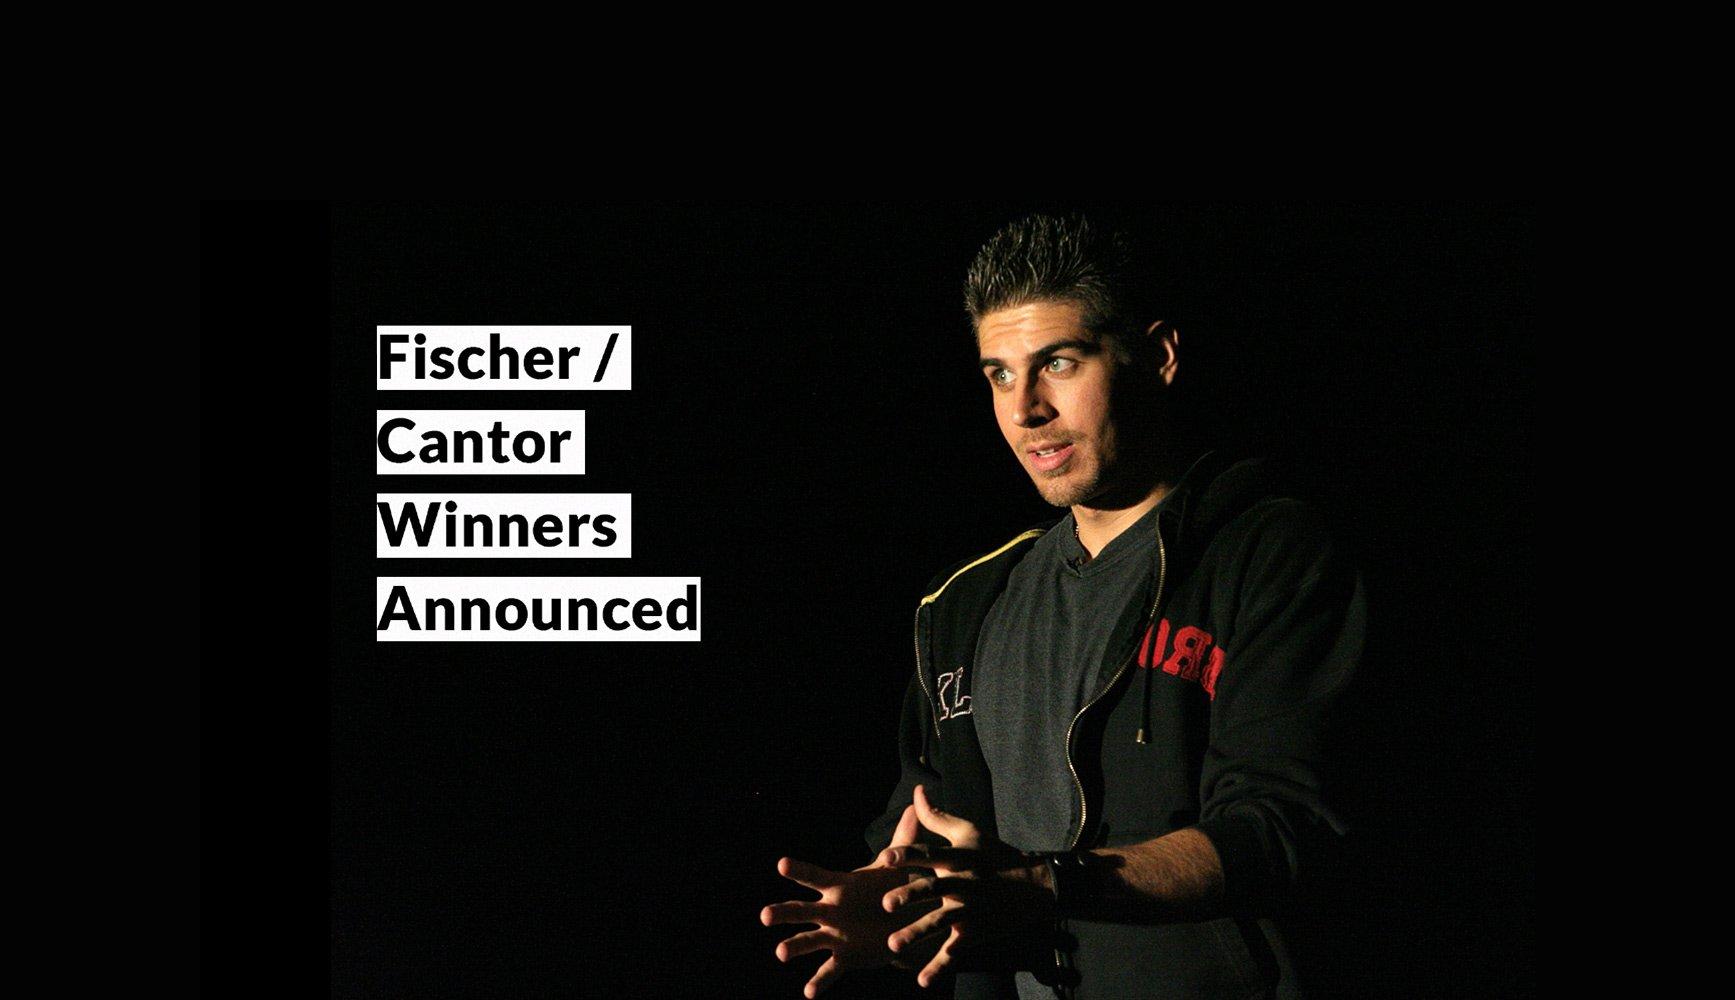 2019 Fischer/Cantor Winners & Poems